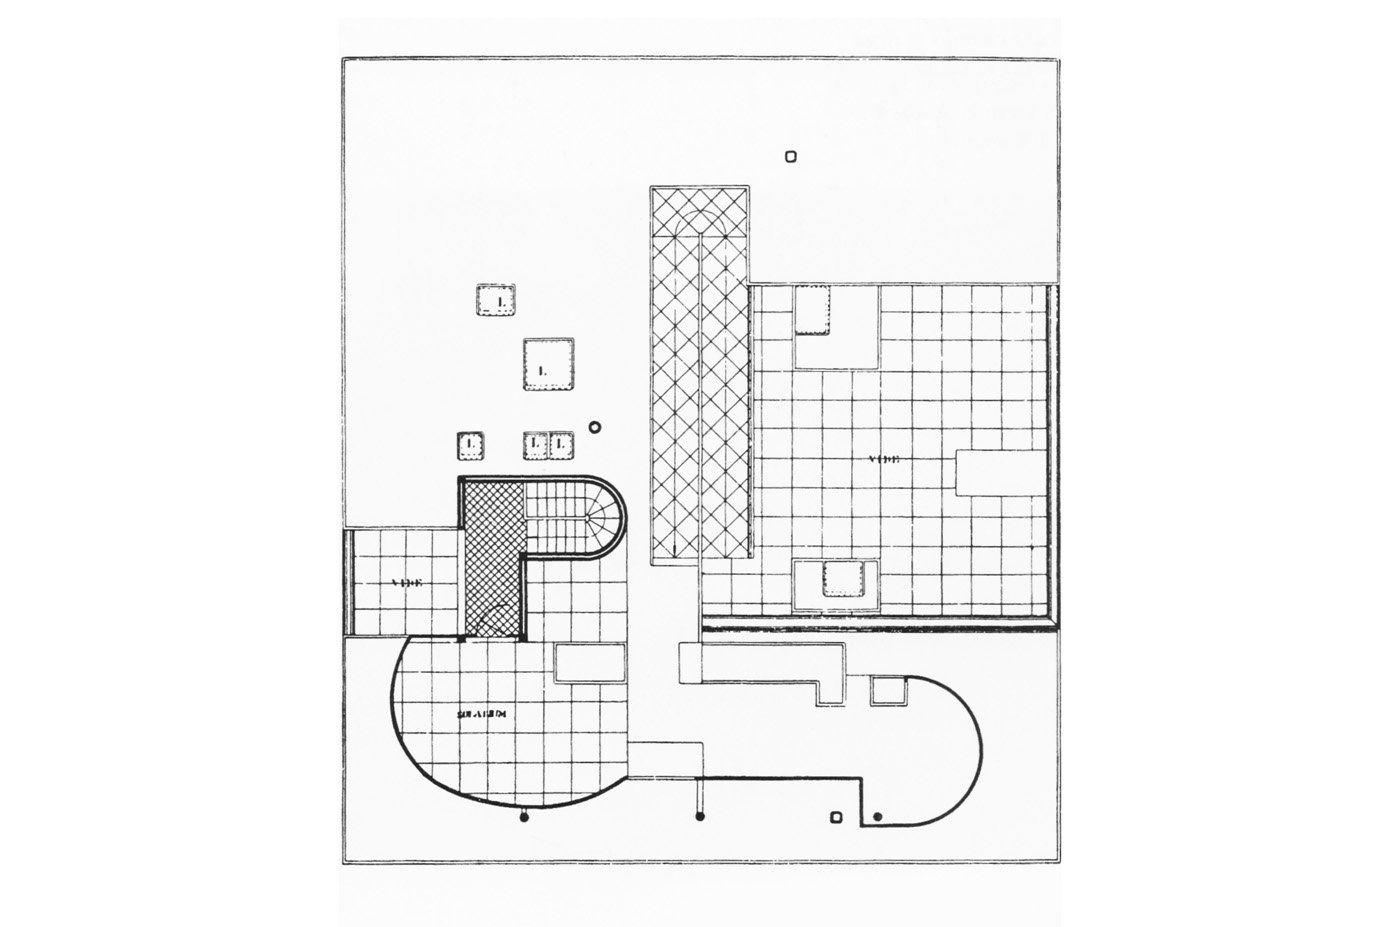 Villa Savoye Le Corbusier S Machine Of Inhabit